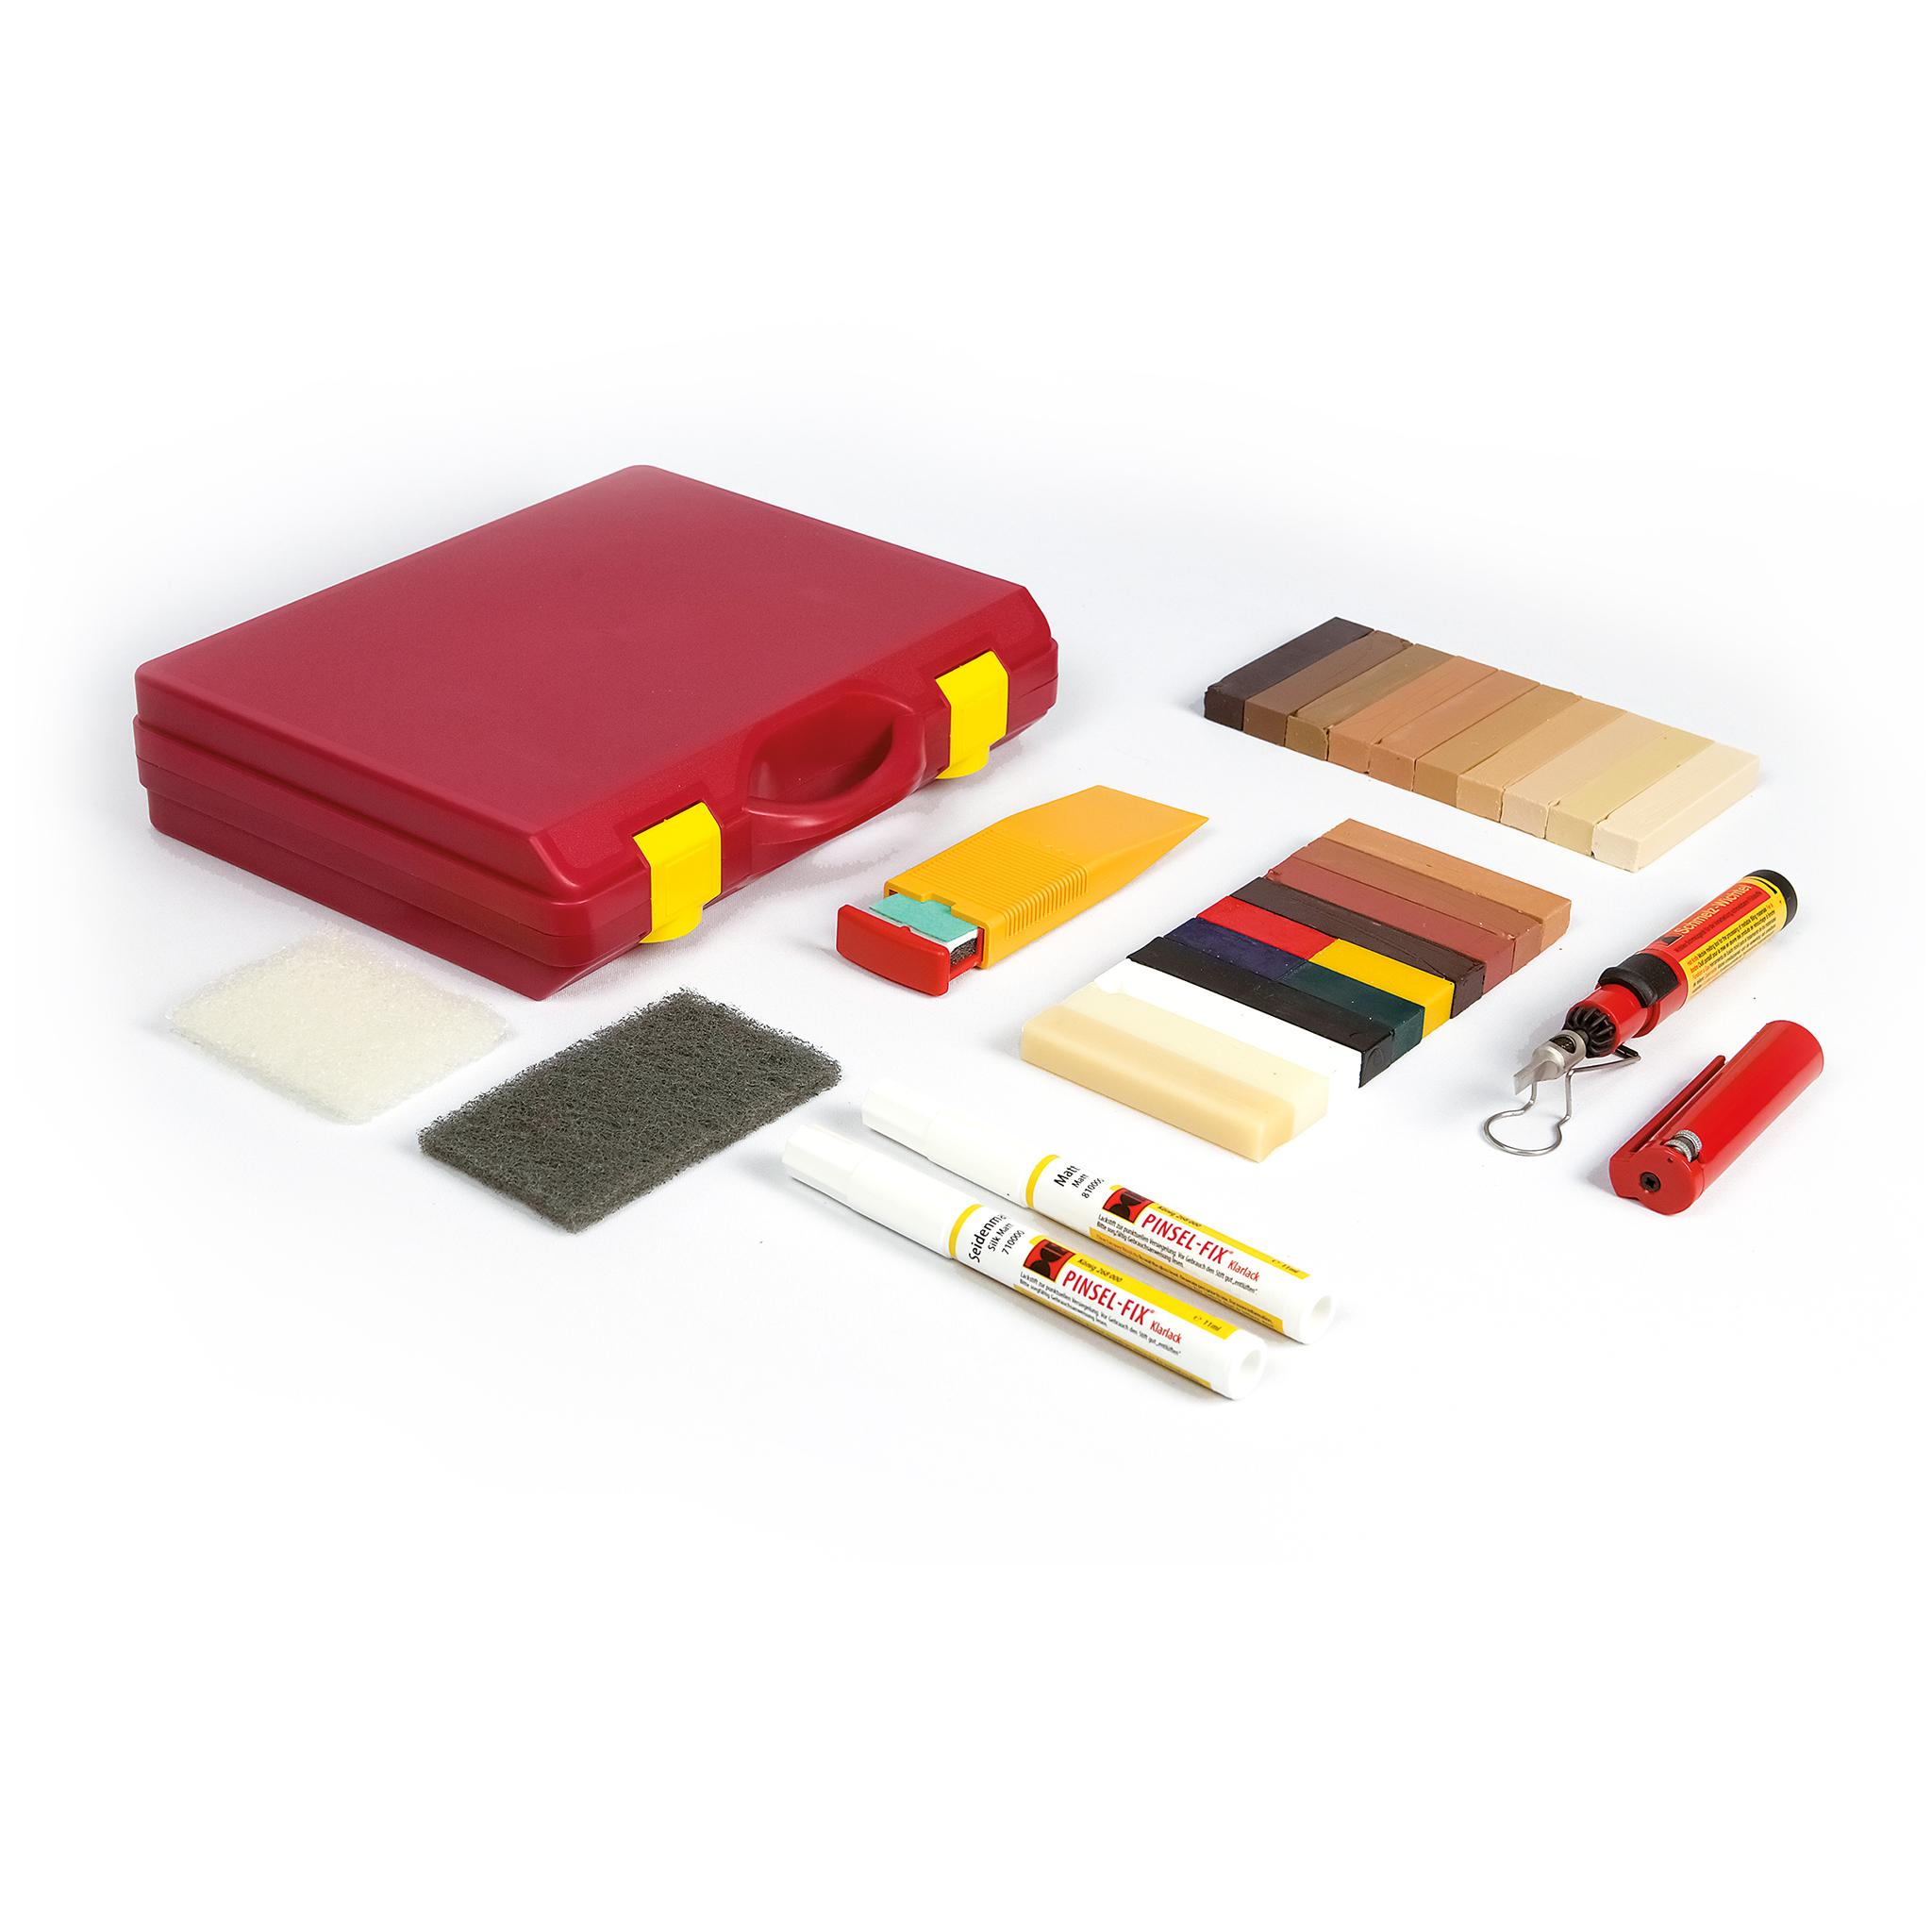 König repair kit Medium